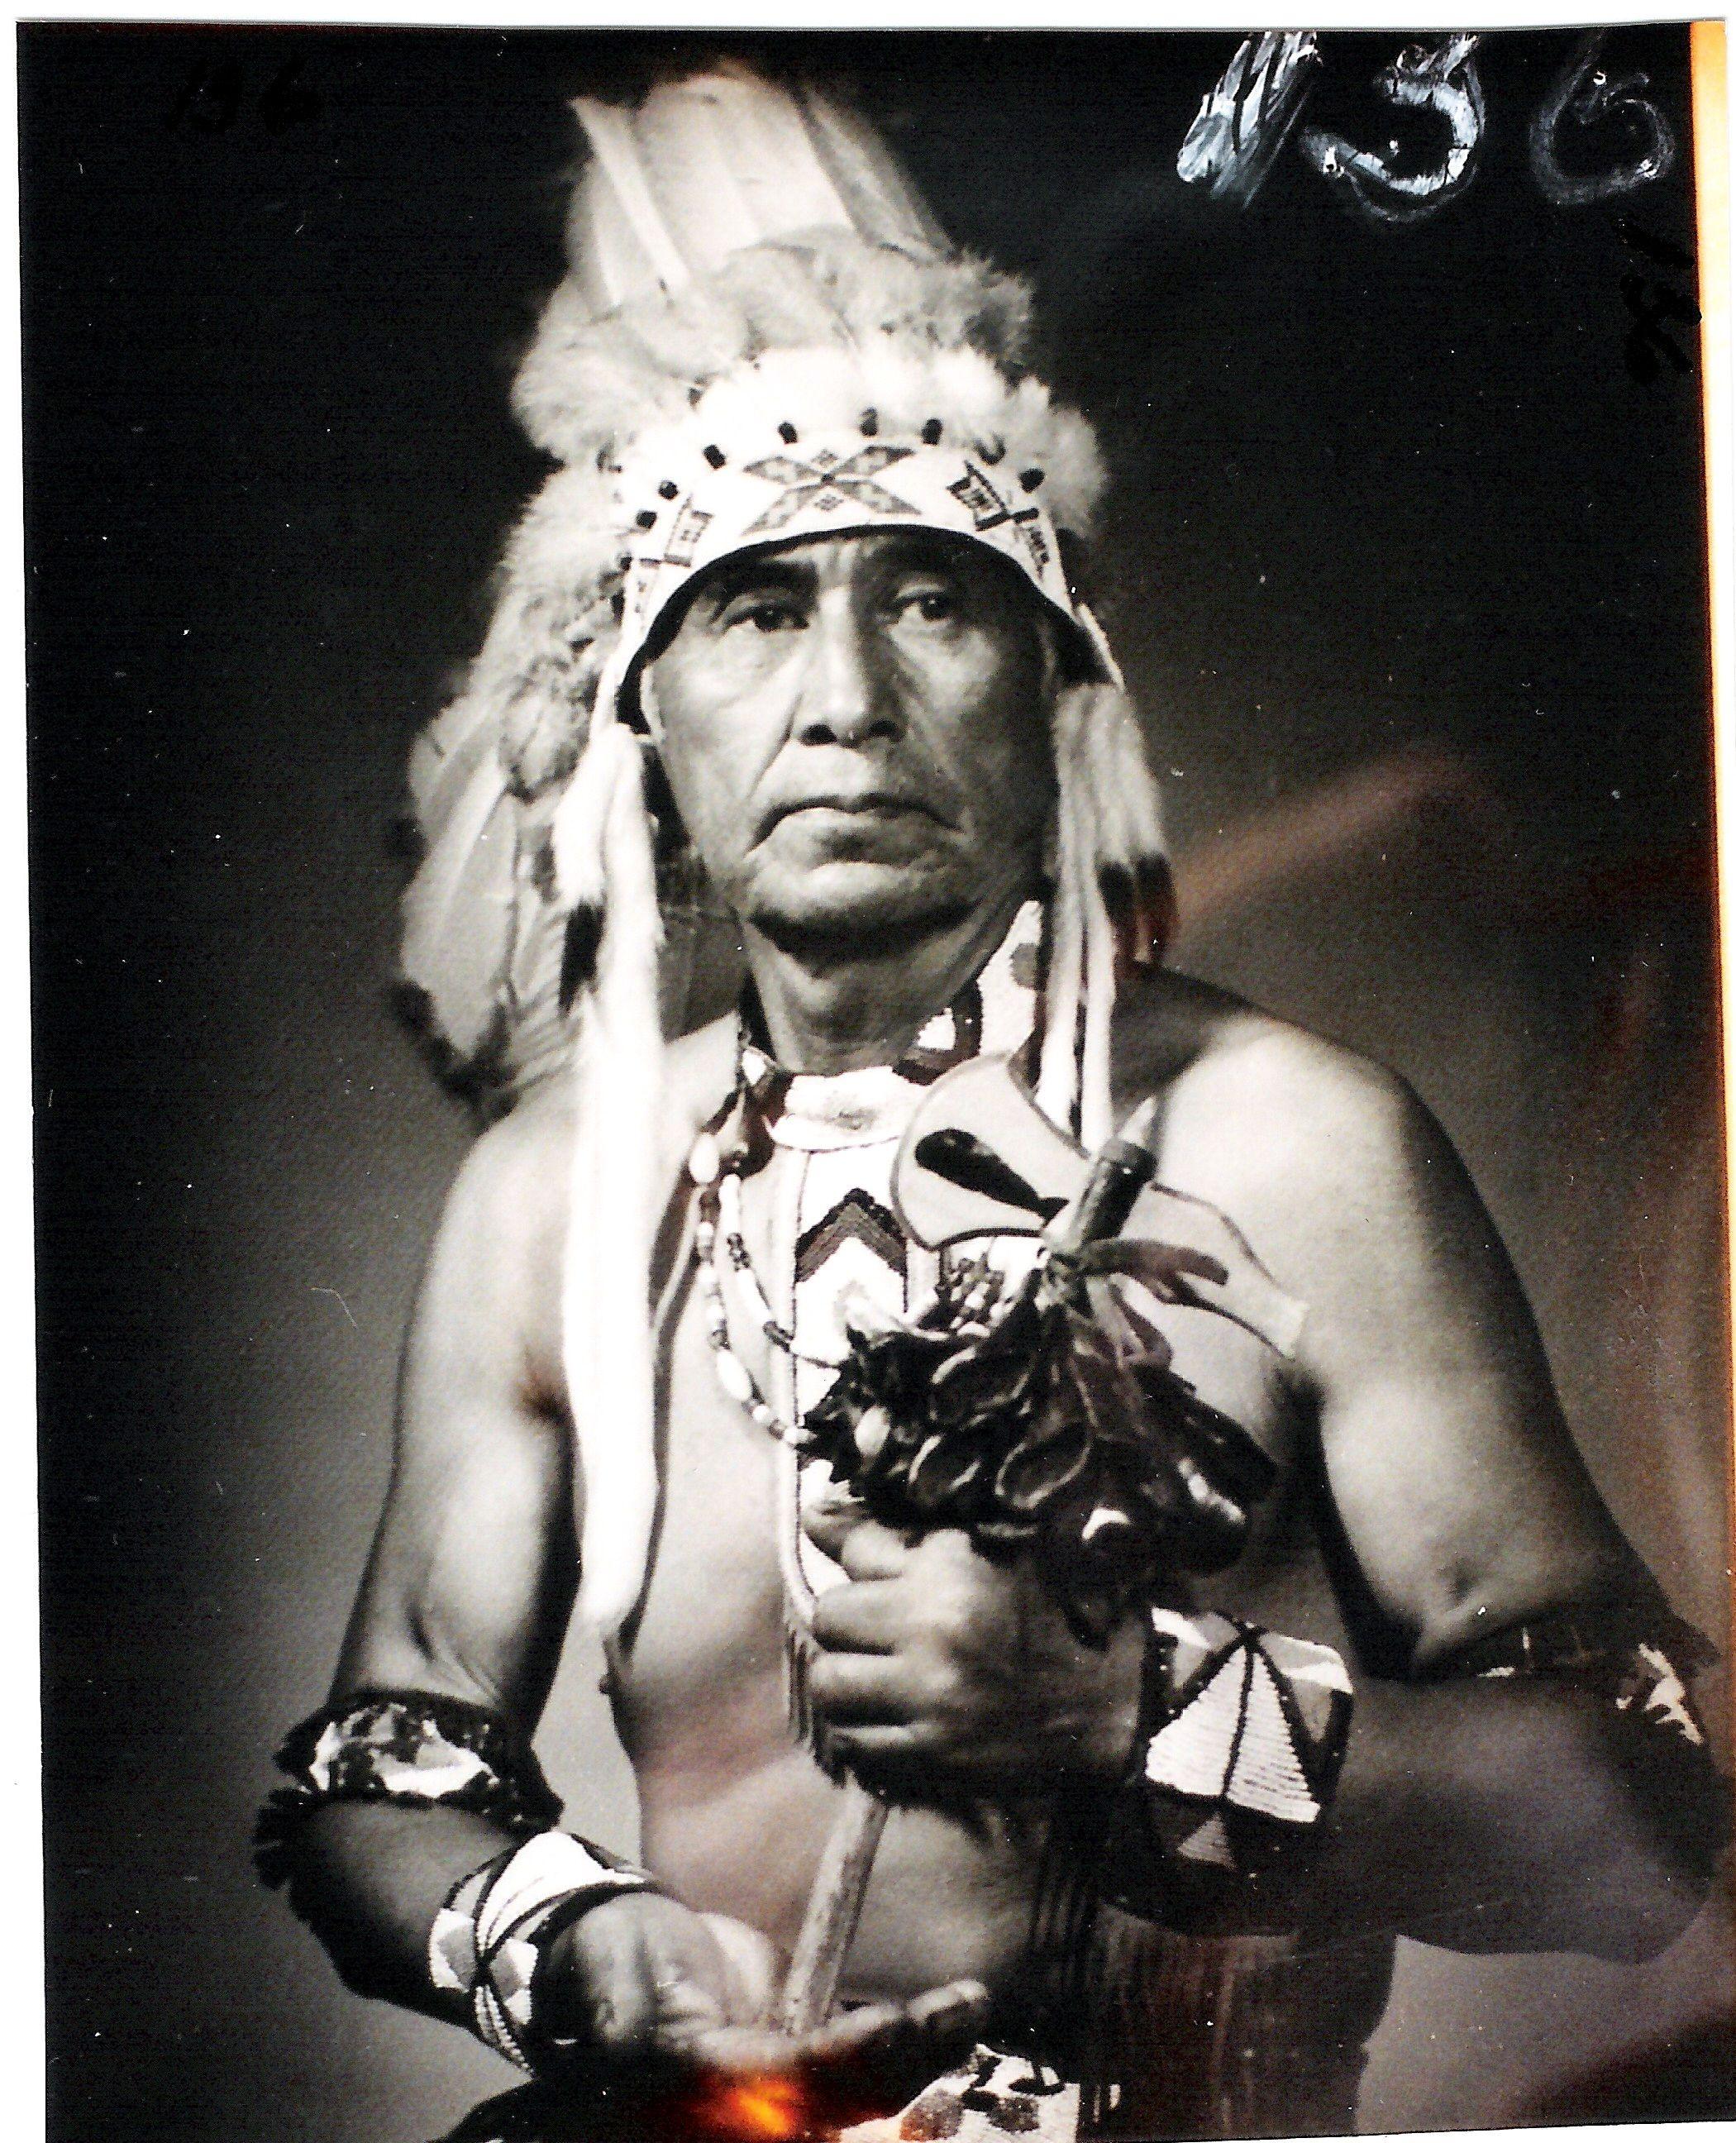 Chief Dan George